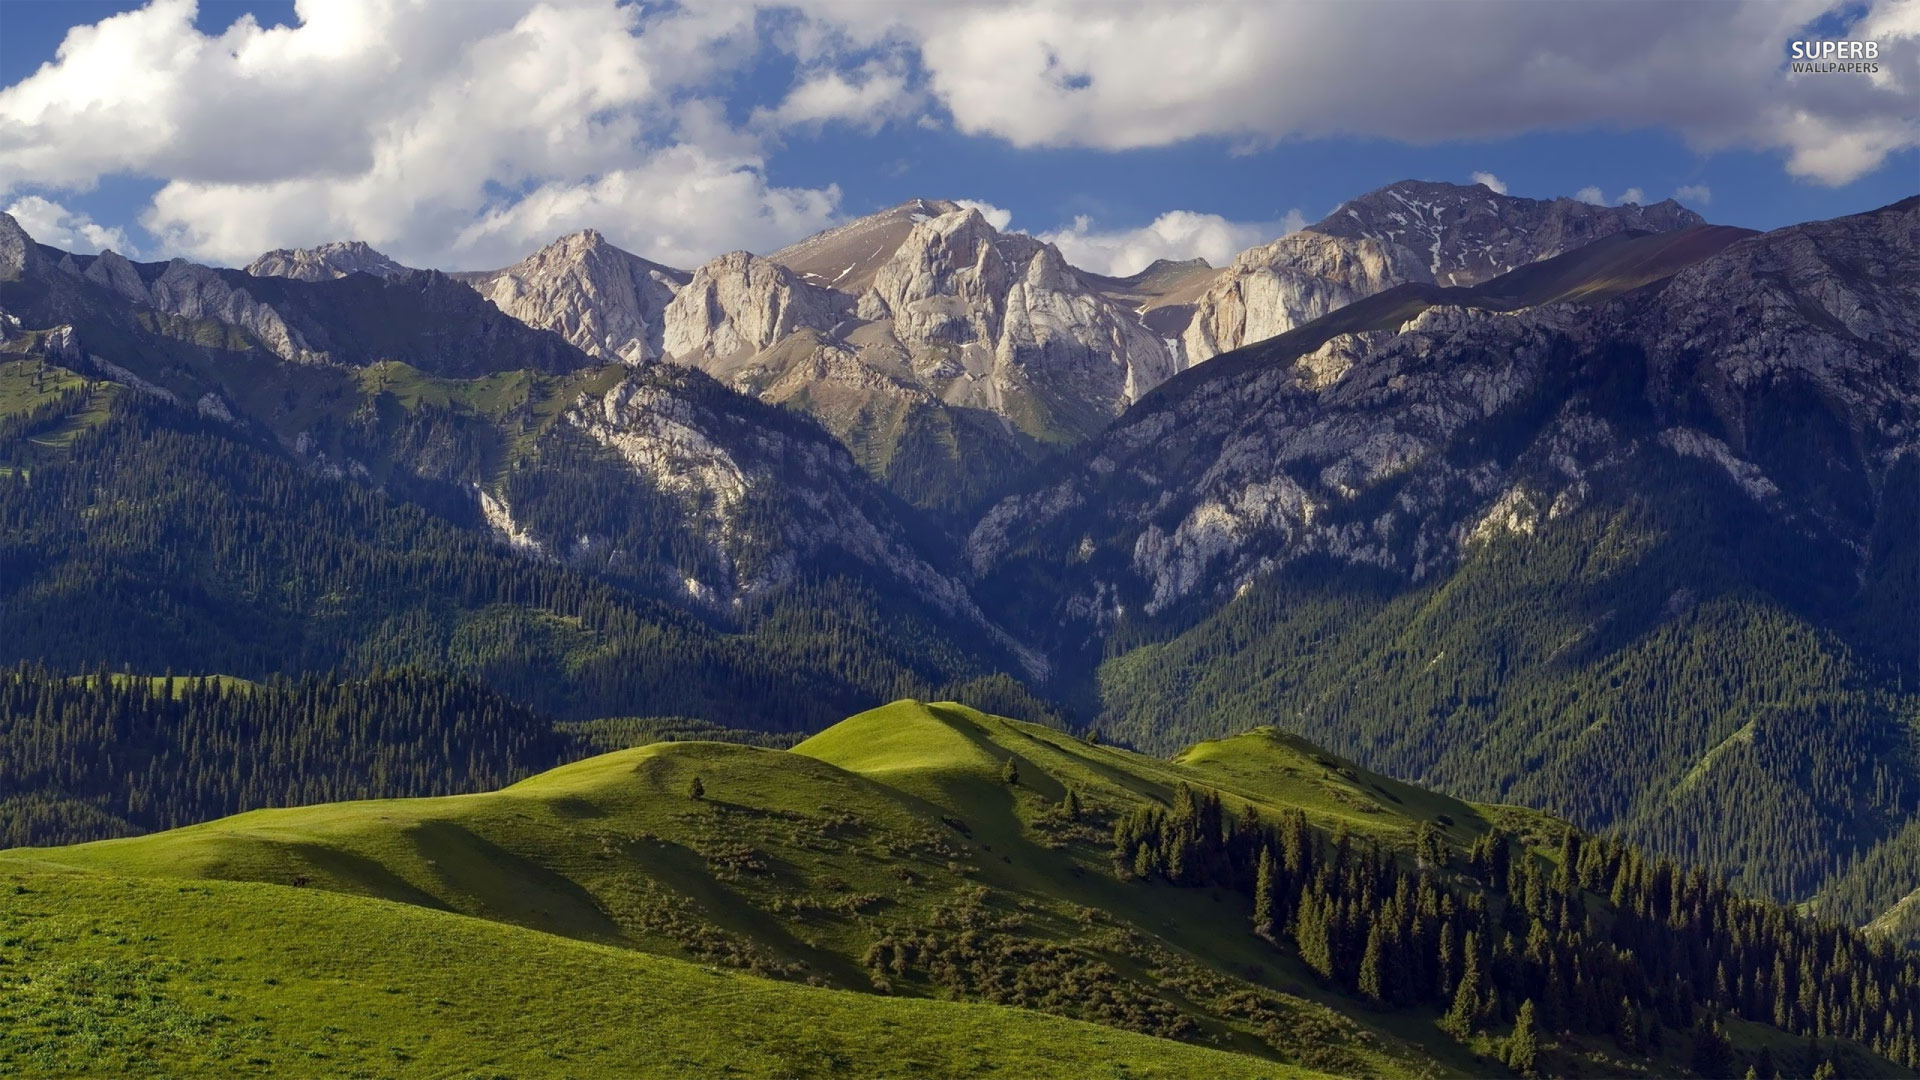 wonderful mountains photo download